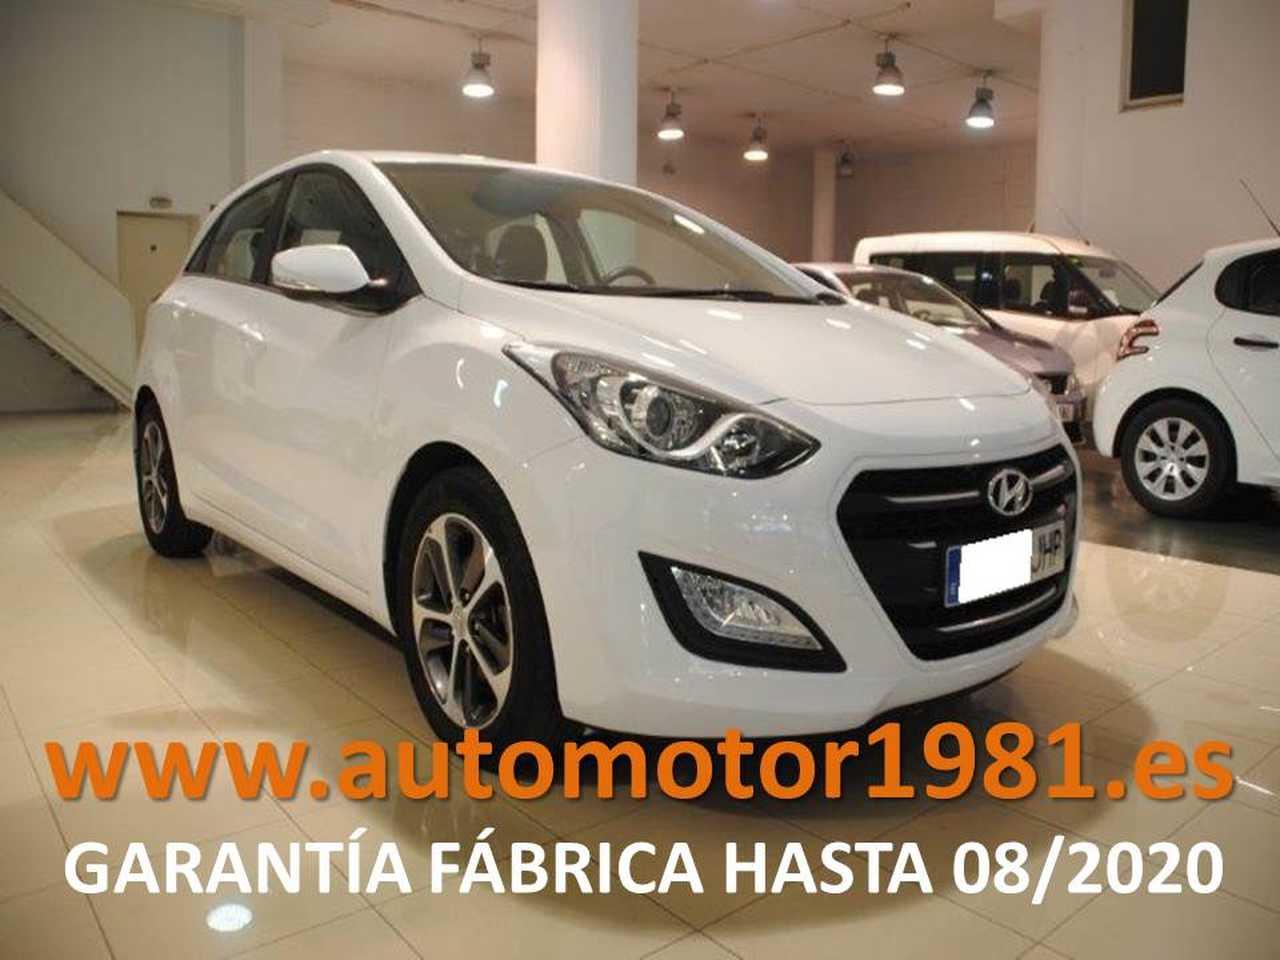 Hyundai i30 1.6CRDi Tecno Aut. - GARANTIA FABRICA 08/2020  - Foto 1